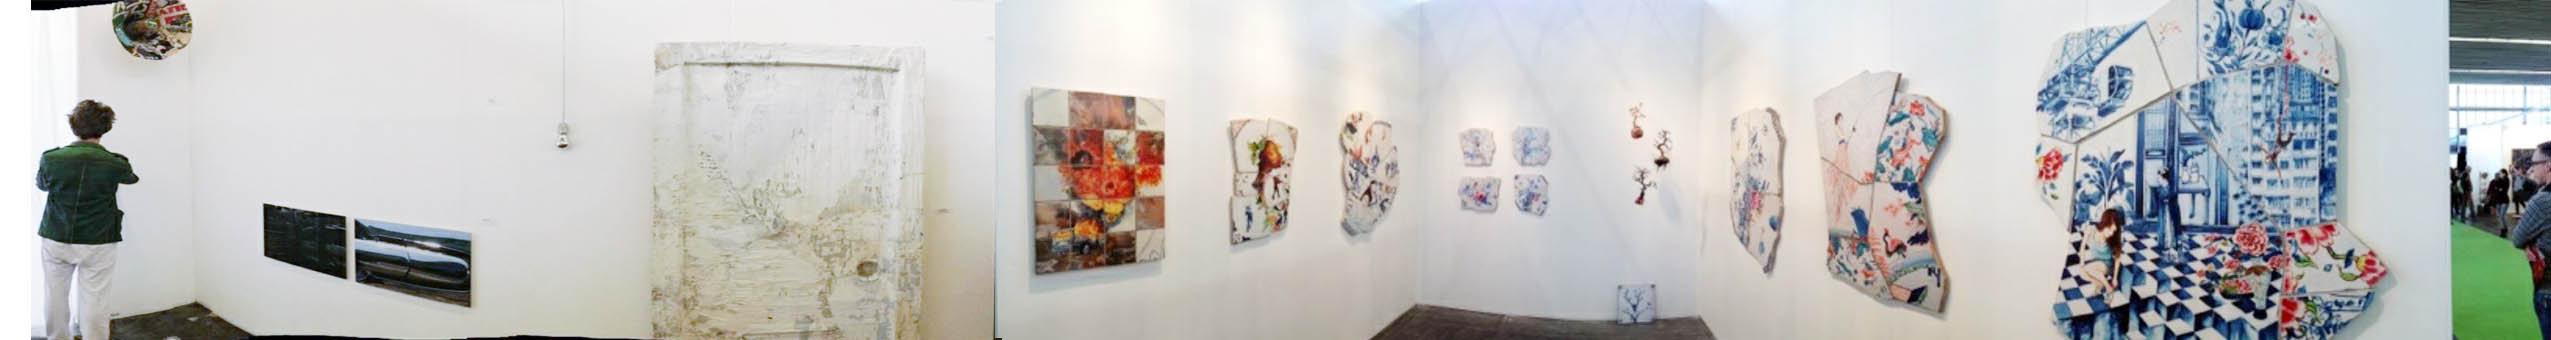 KunstRAI 2013 - Suzanne Biederberg Gallery (Stand 53)